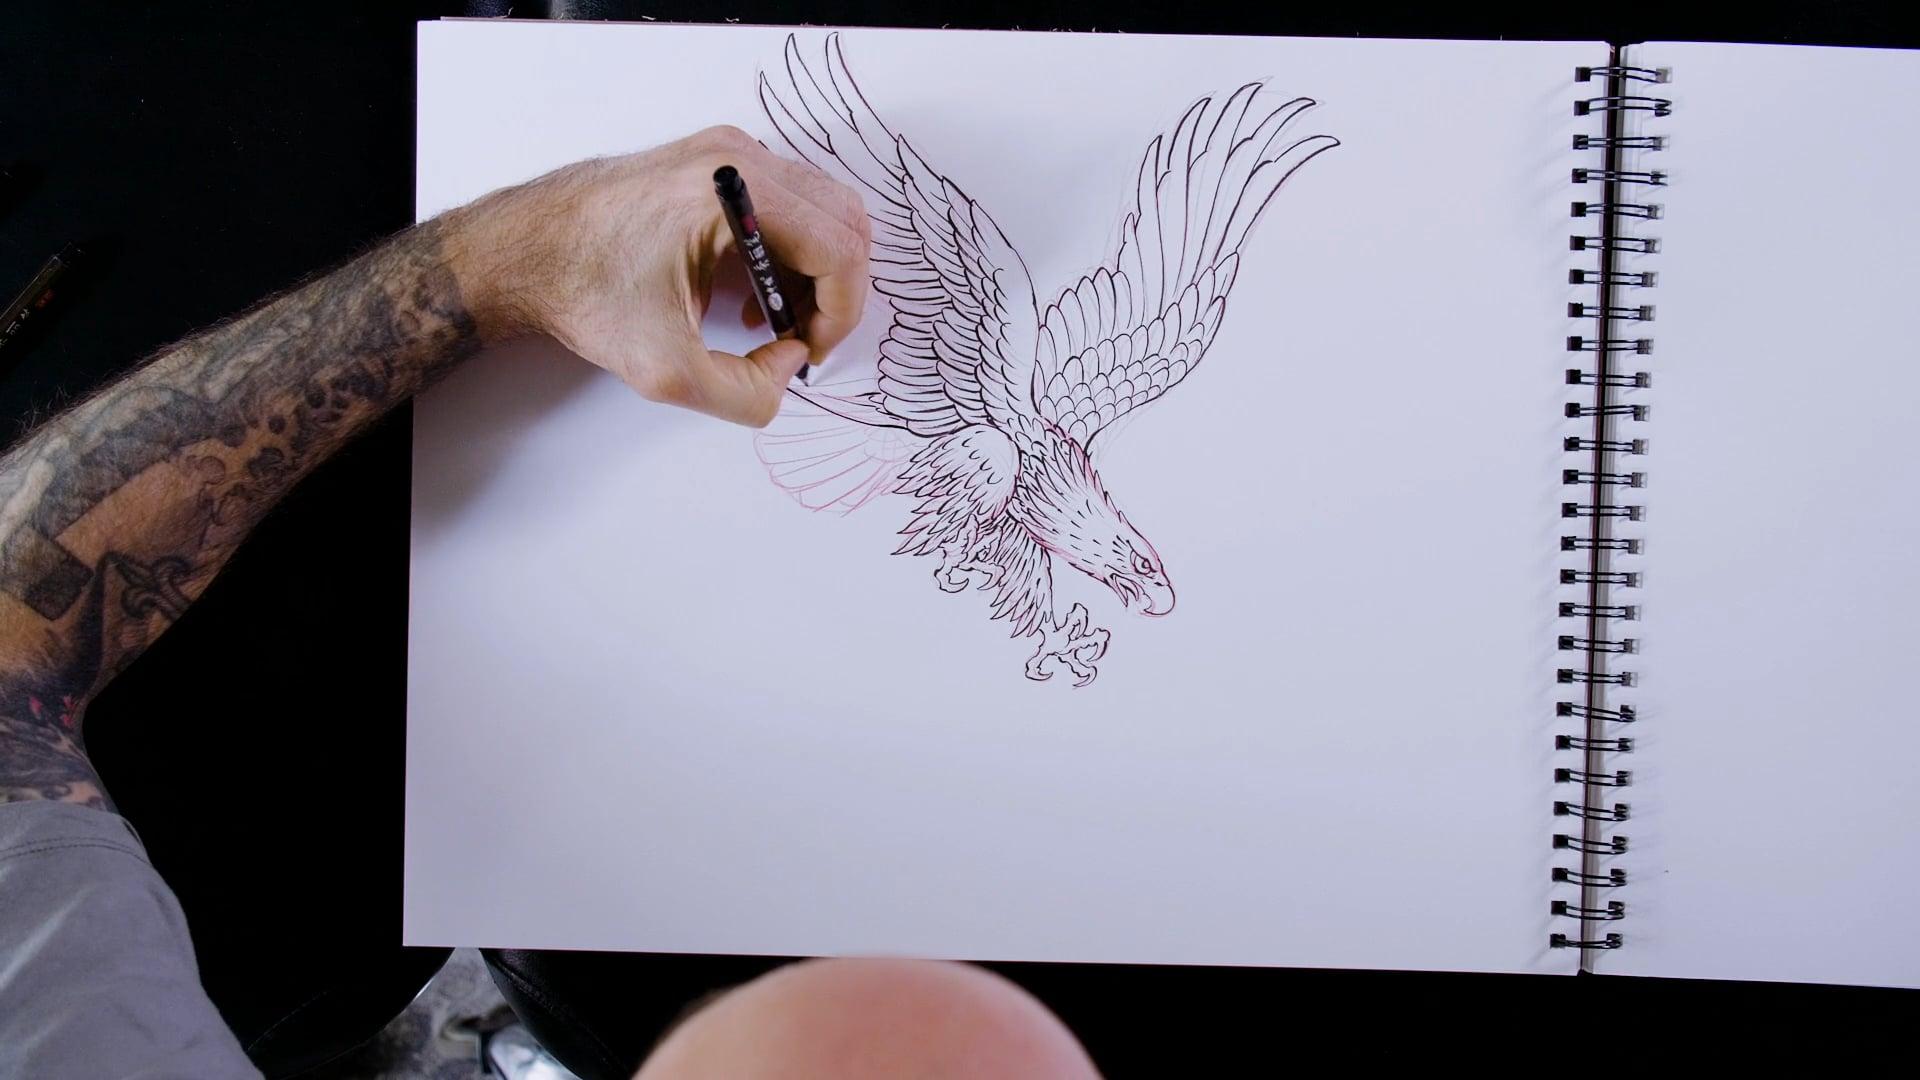 Chris Garver: A Vision of Freedom